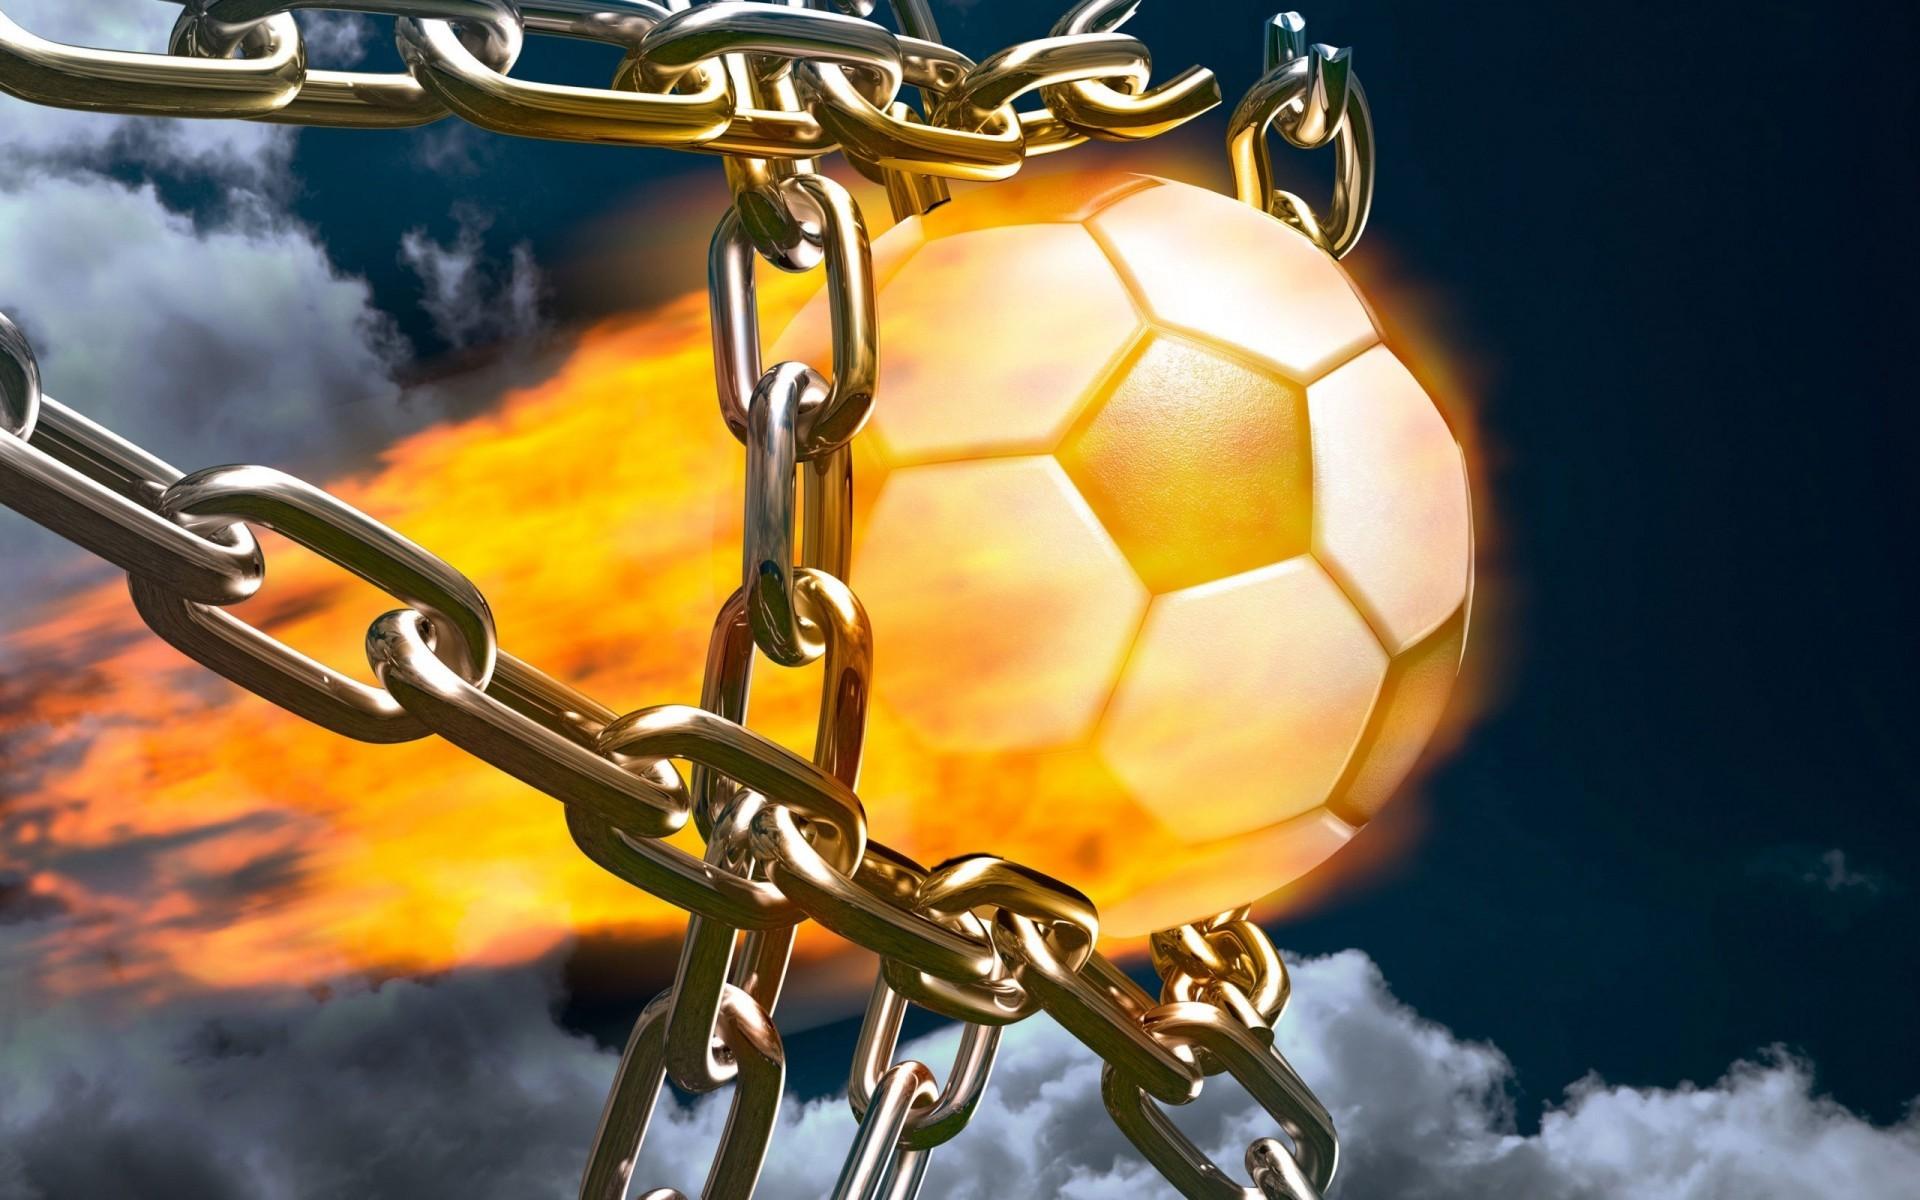 Атака мячиков  № 1547858 бесплатно